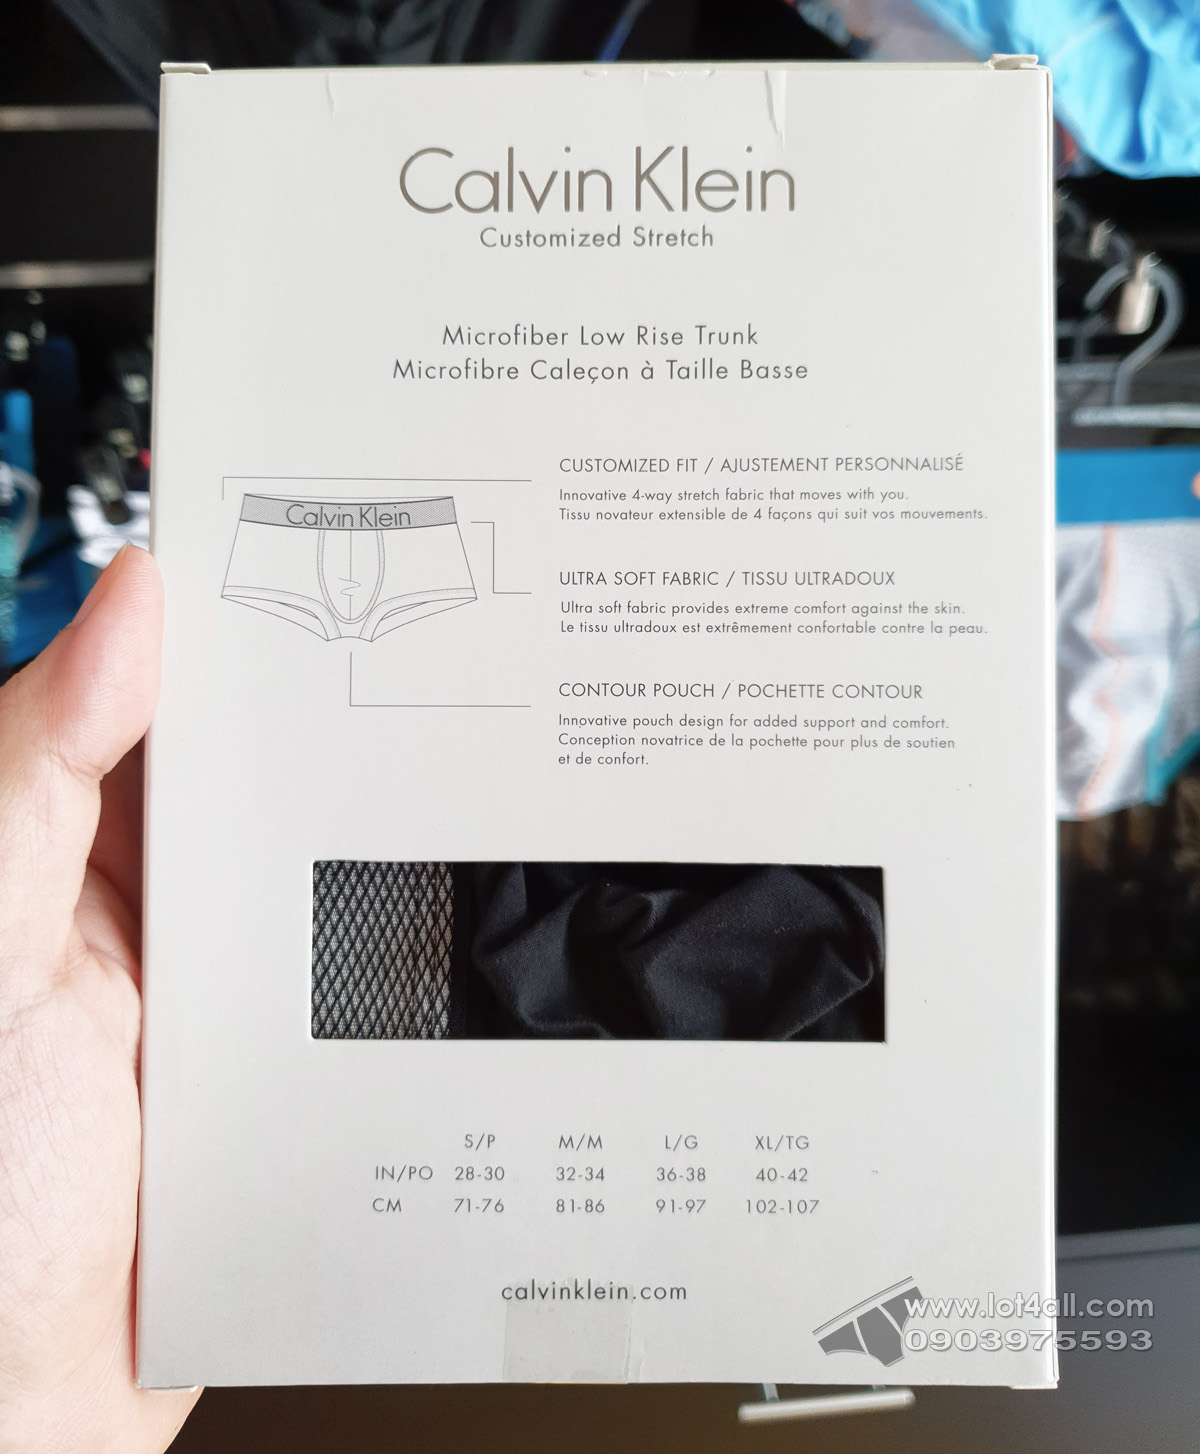 Quần lót nam Calvin Klein NB1295 Customized Stretch Low Rise Trunk Black